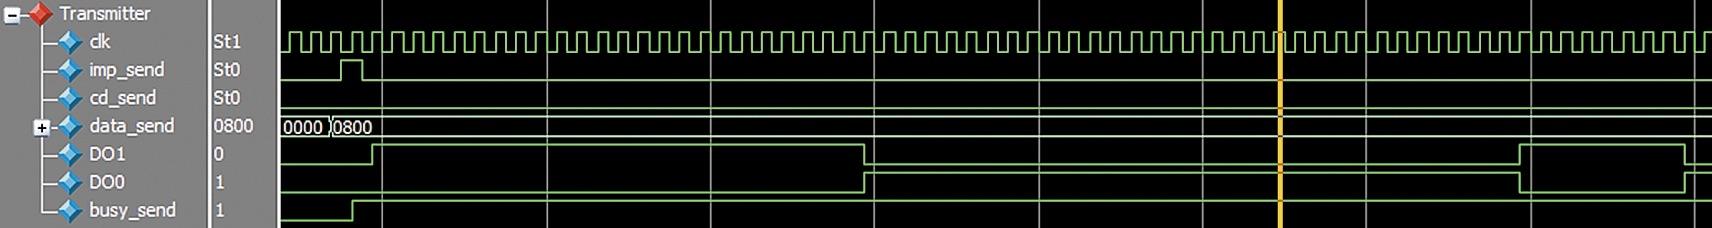 Сигналы ввода/вывода модуля Transmitter.v